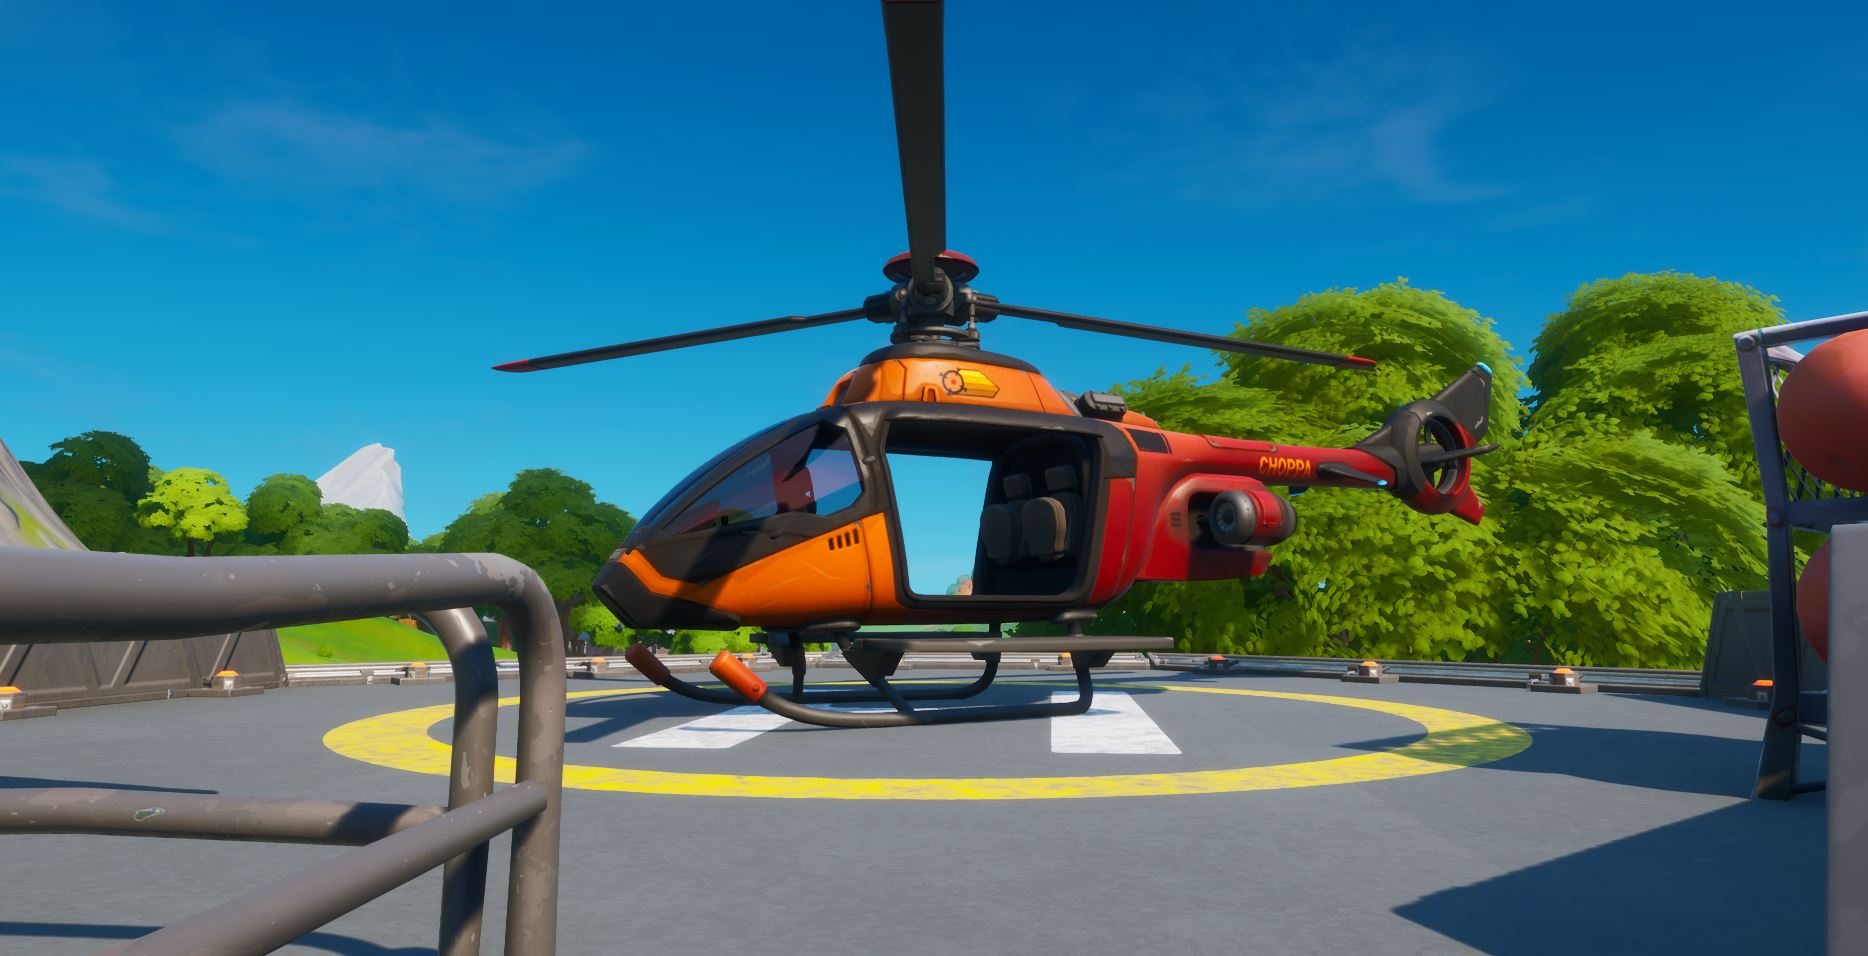 Choppa or helicopter in Fortnite